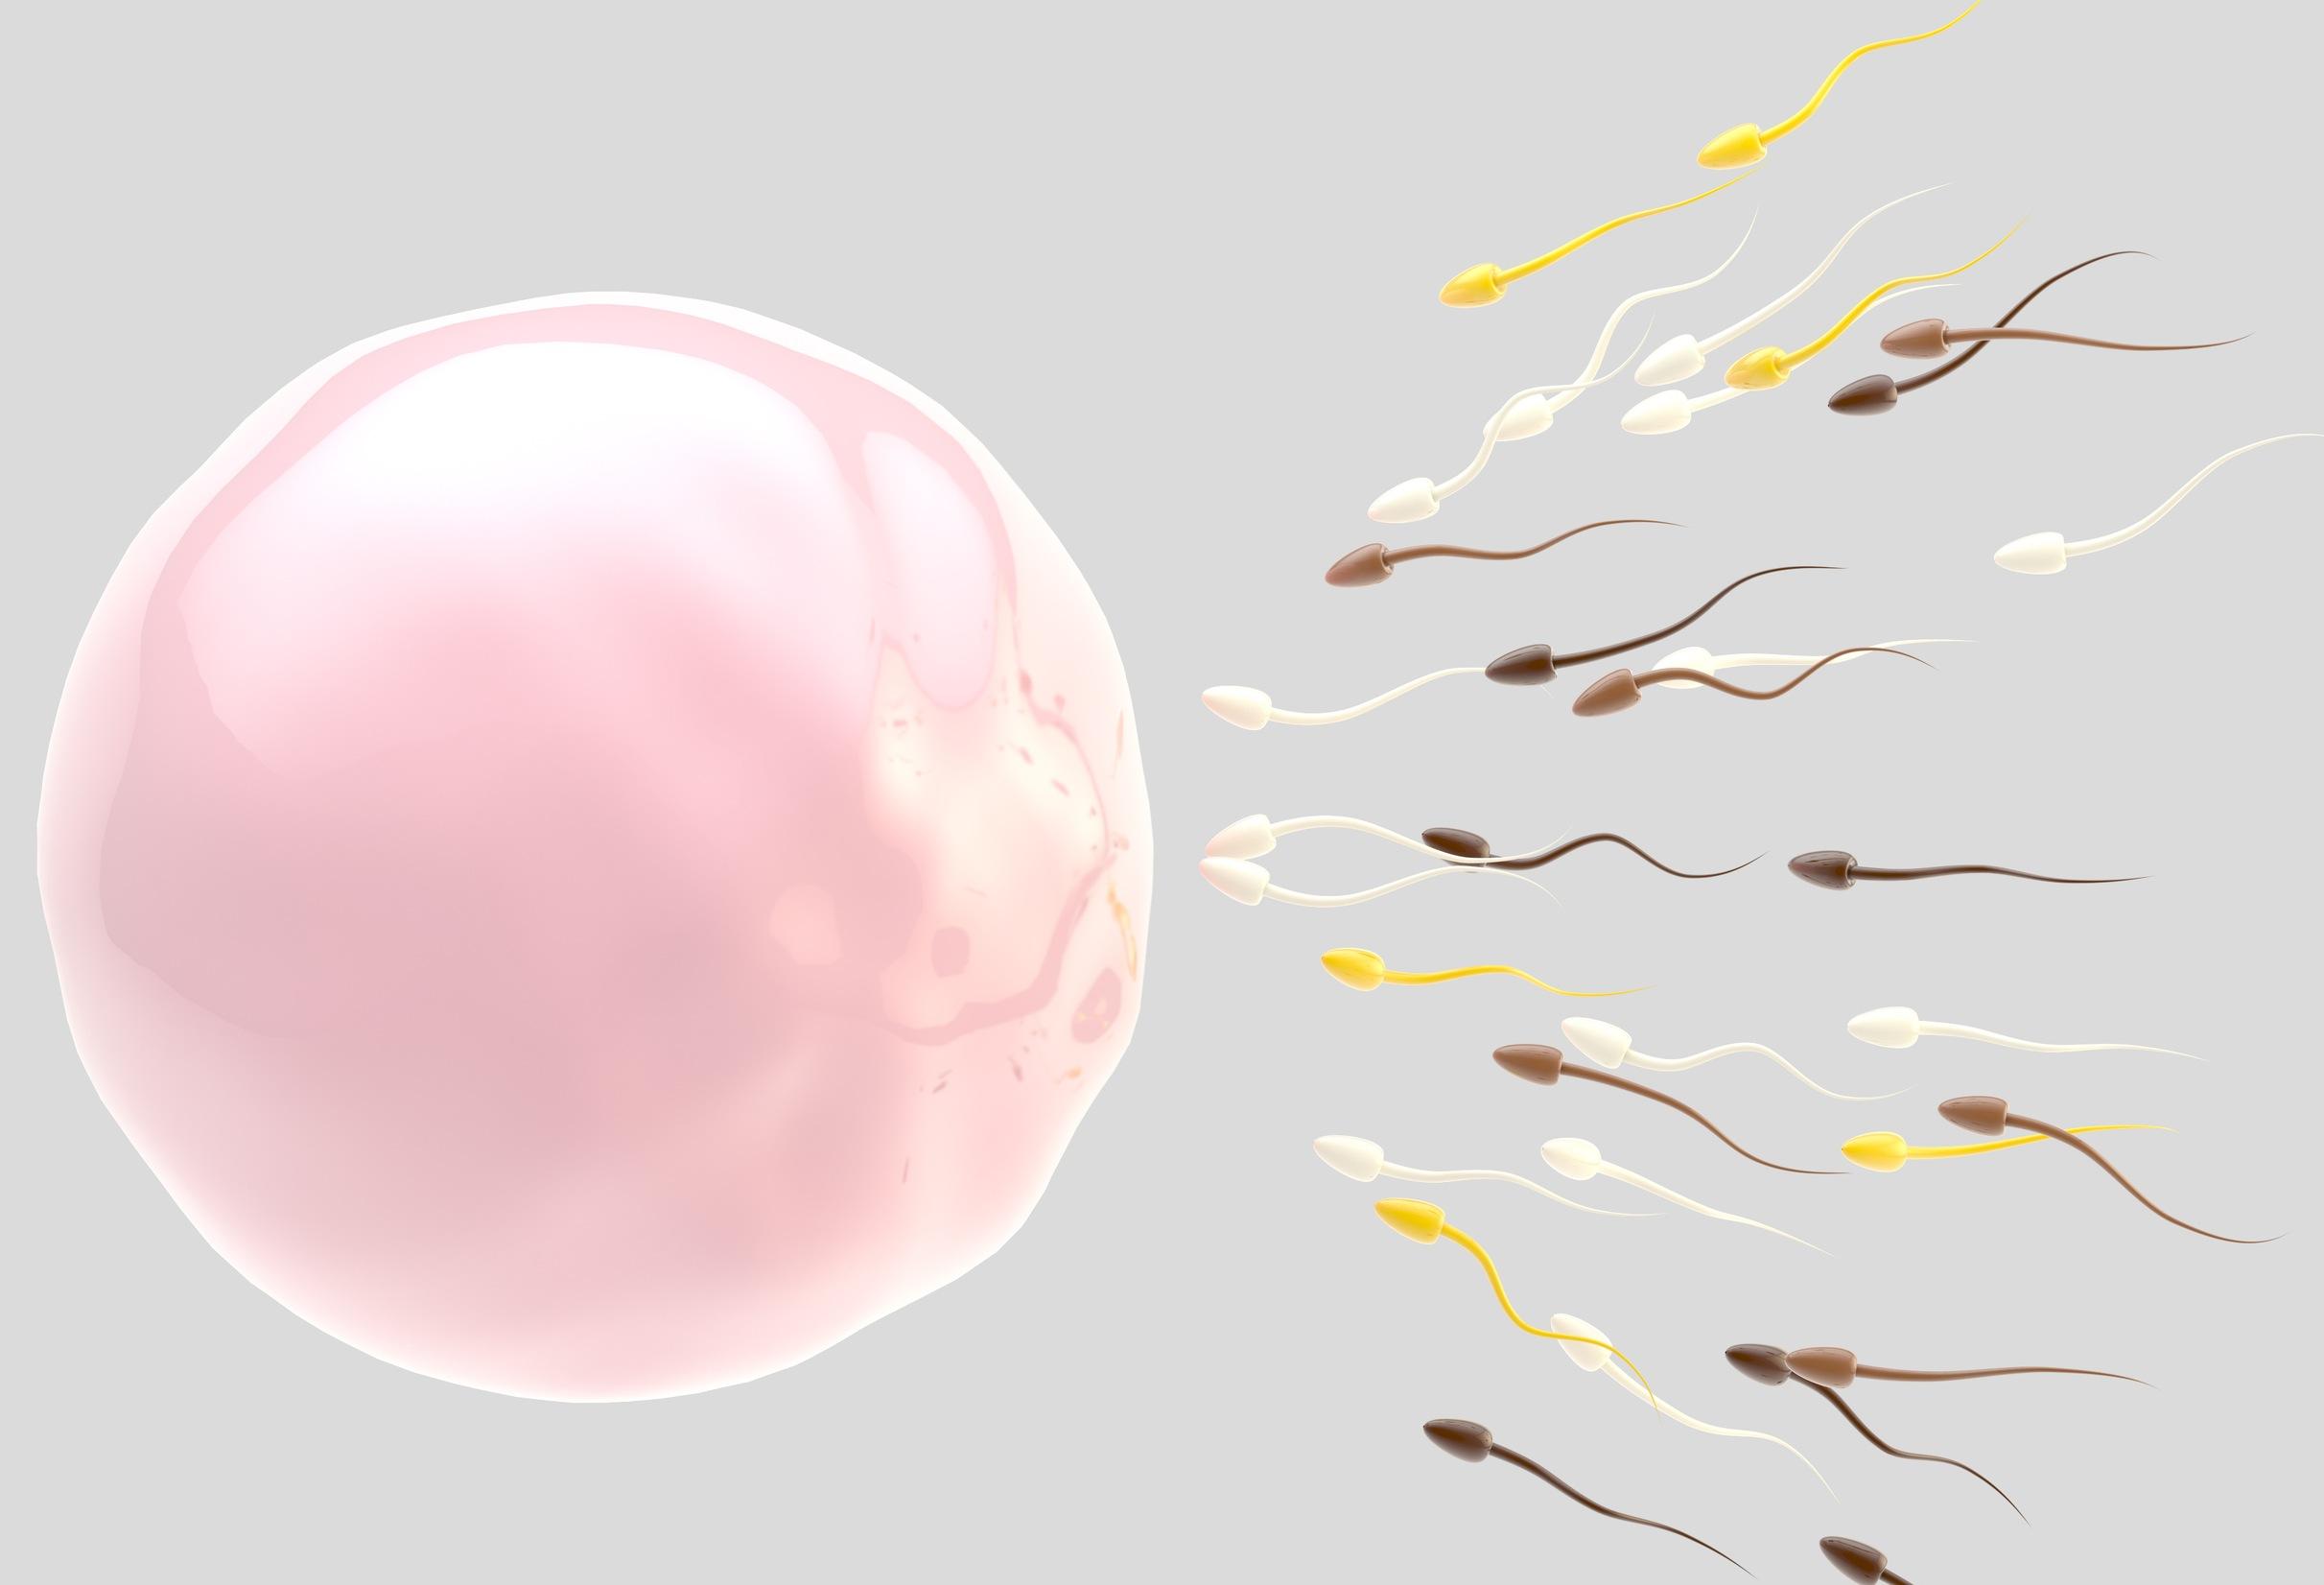 causas-de-infertilidad-alt